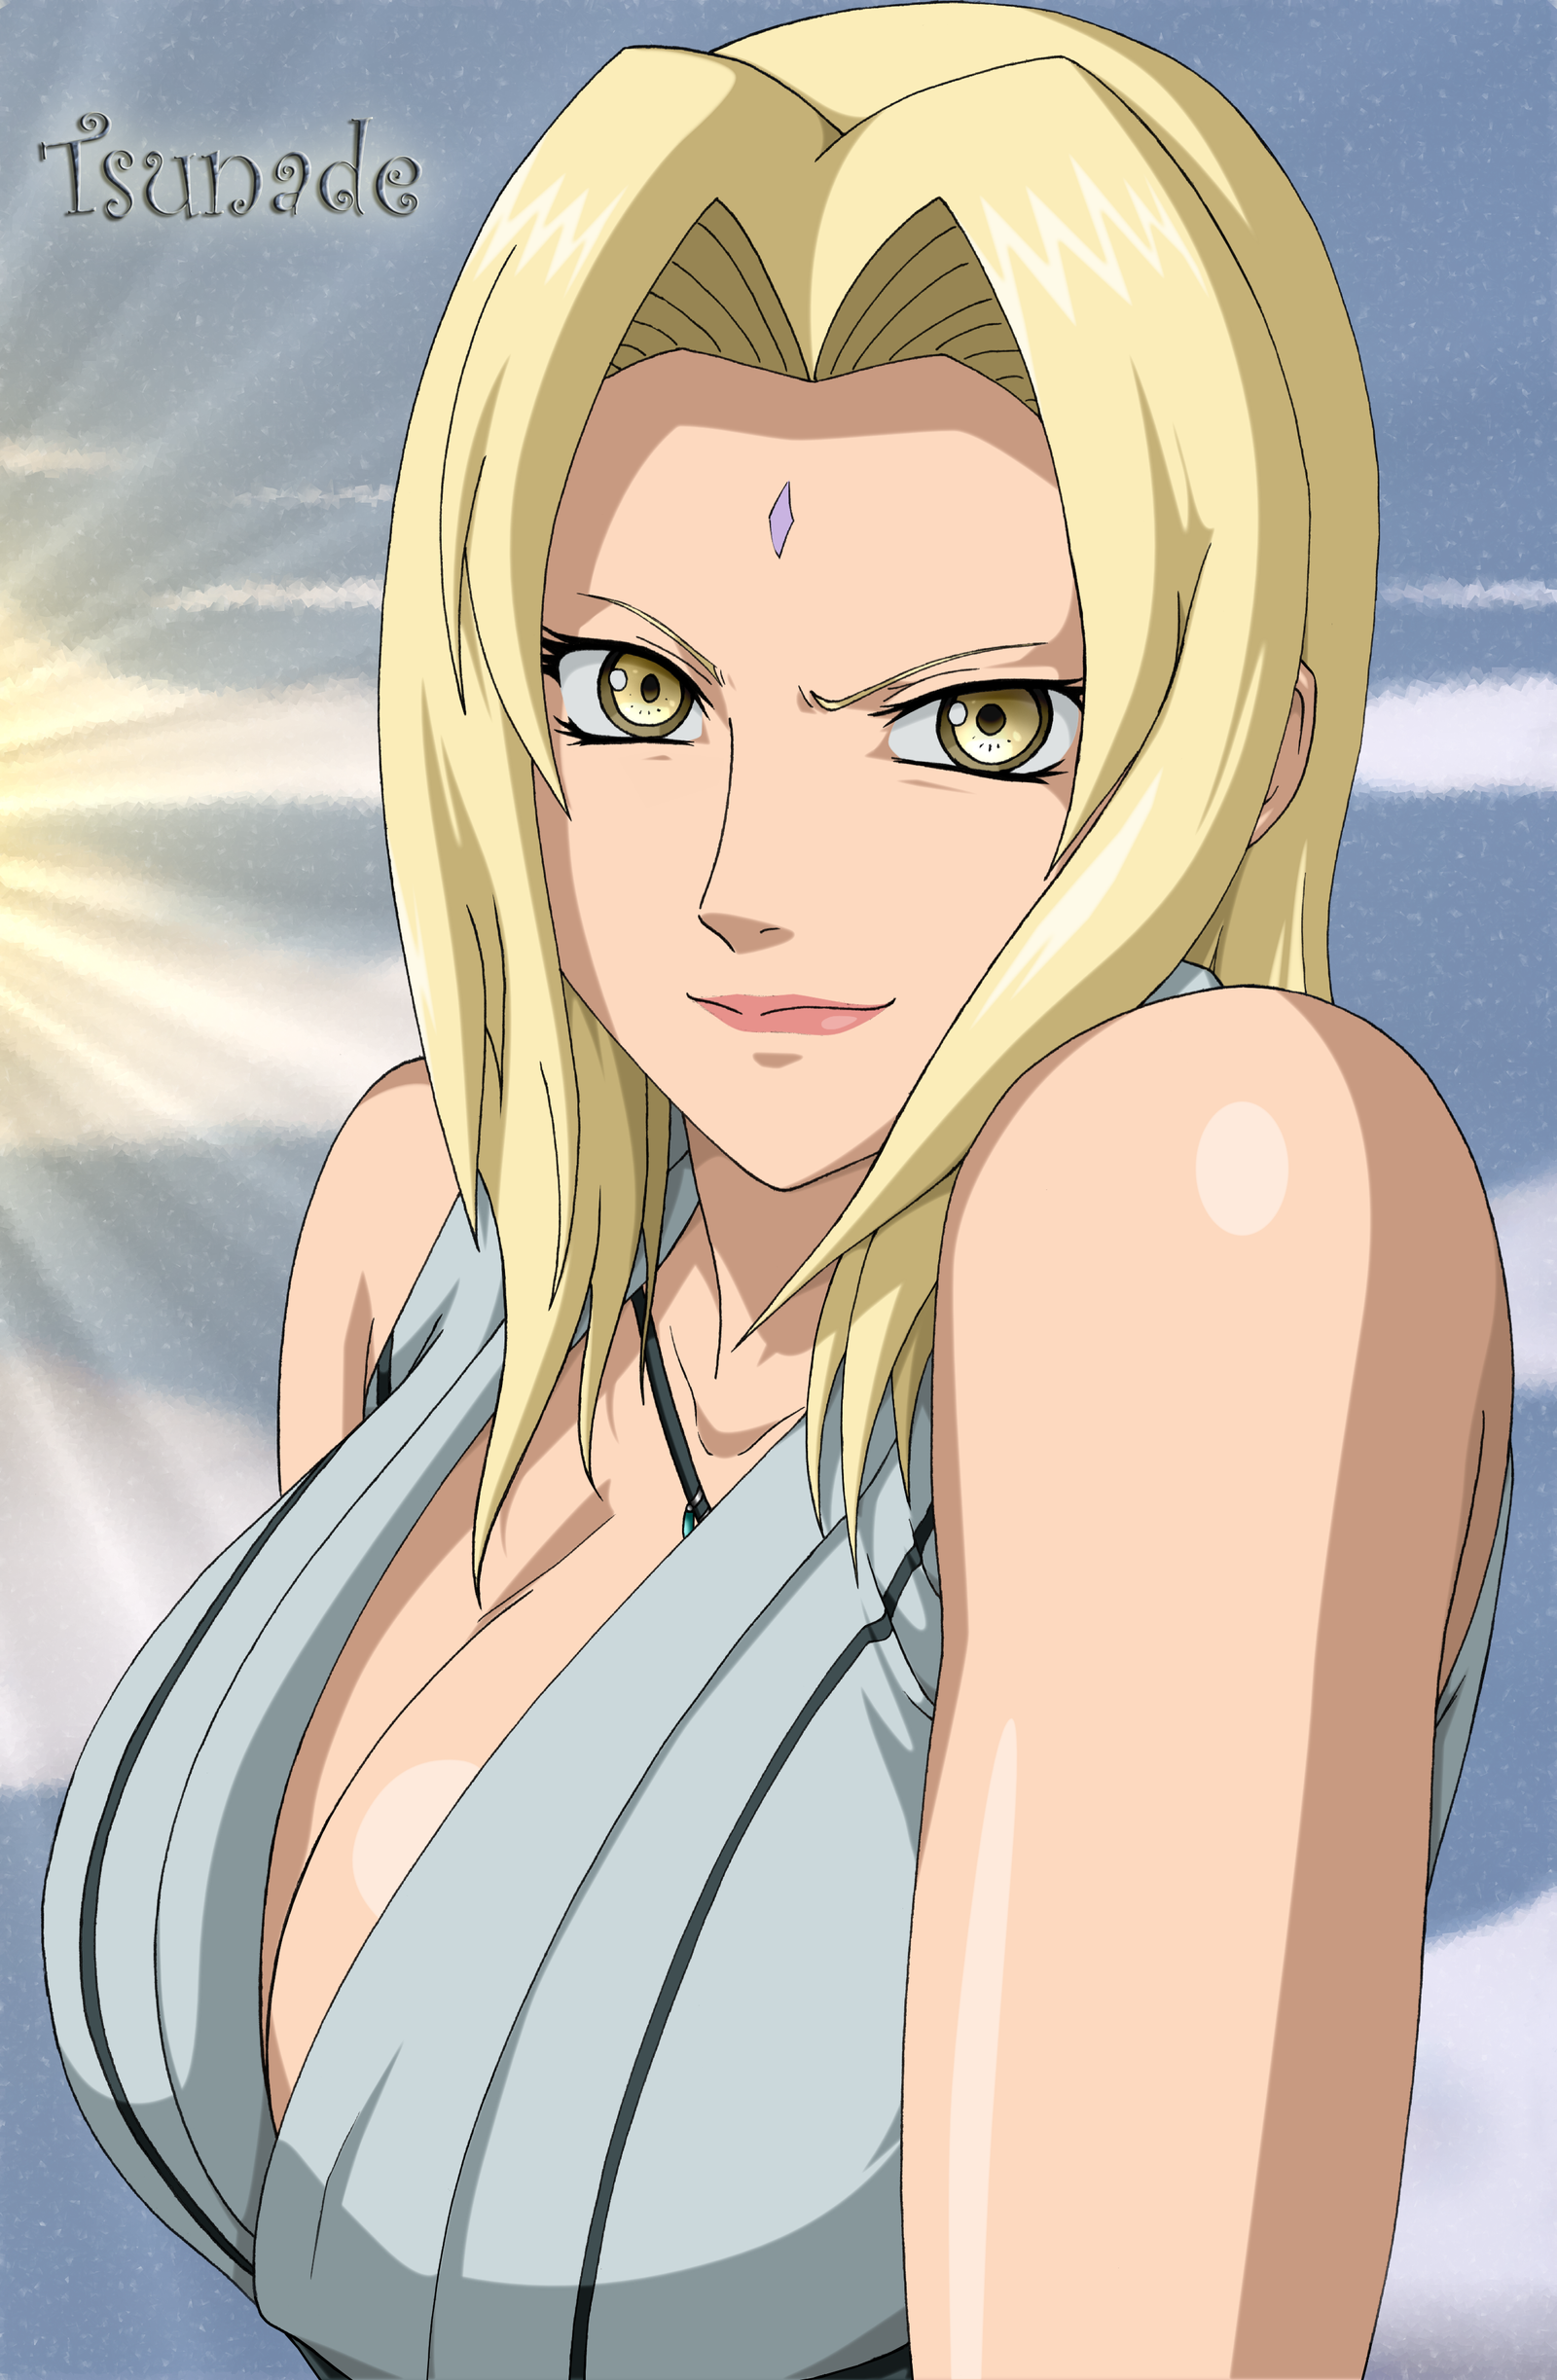 Sexy Tsunade from Naruto by KaenDD on DeviantArt